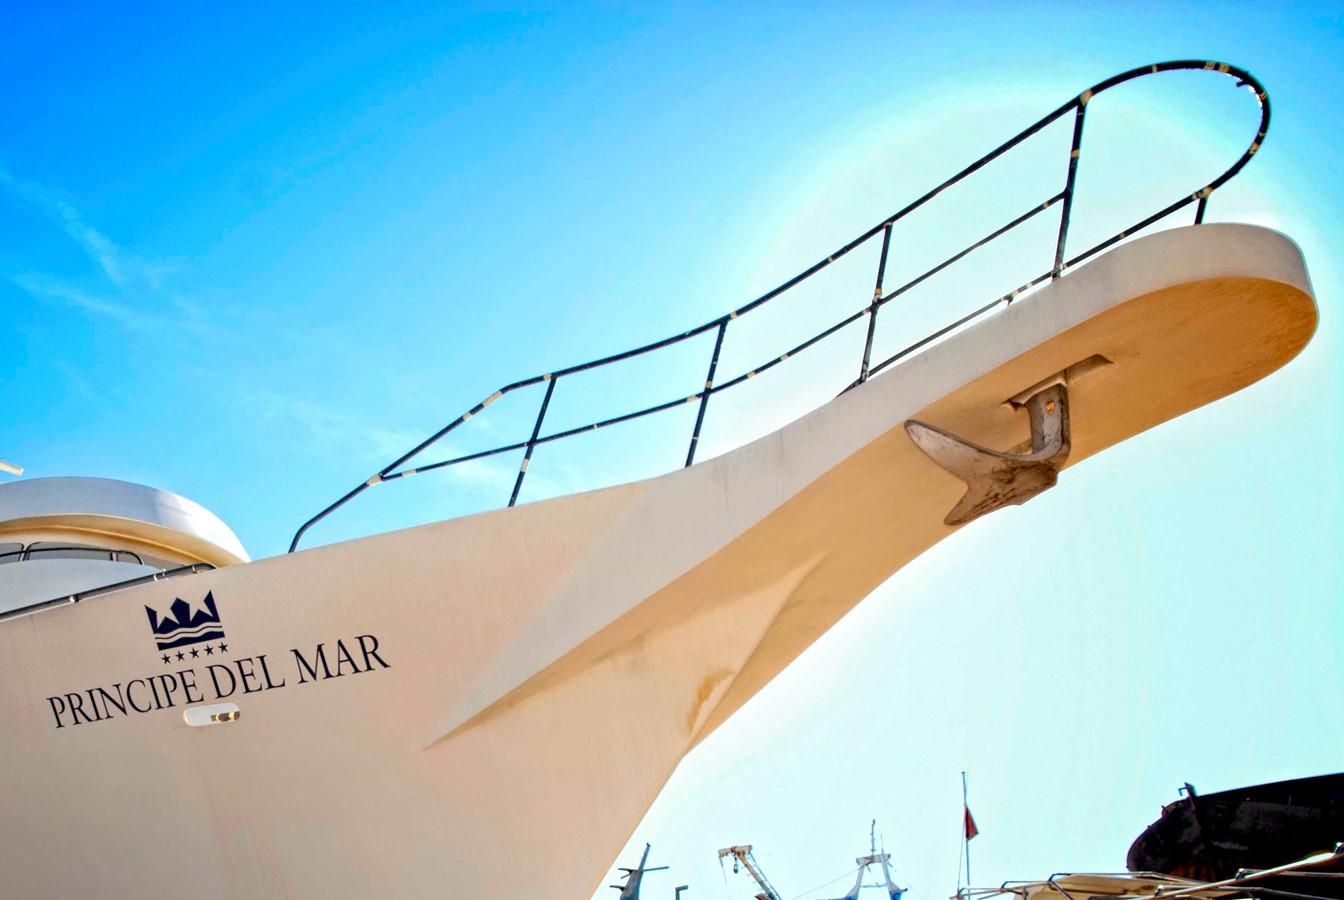 Principe Del Mar yacht for sale